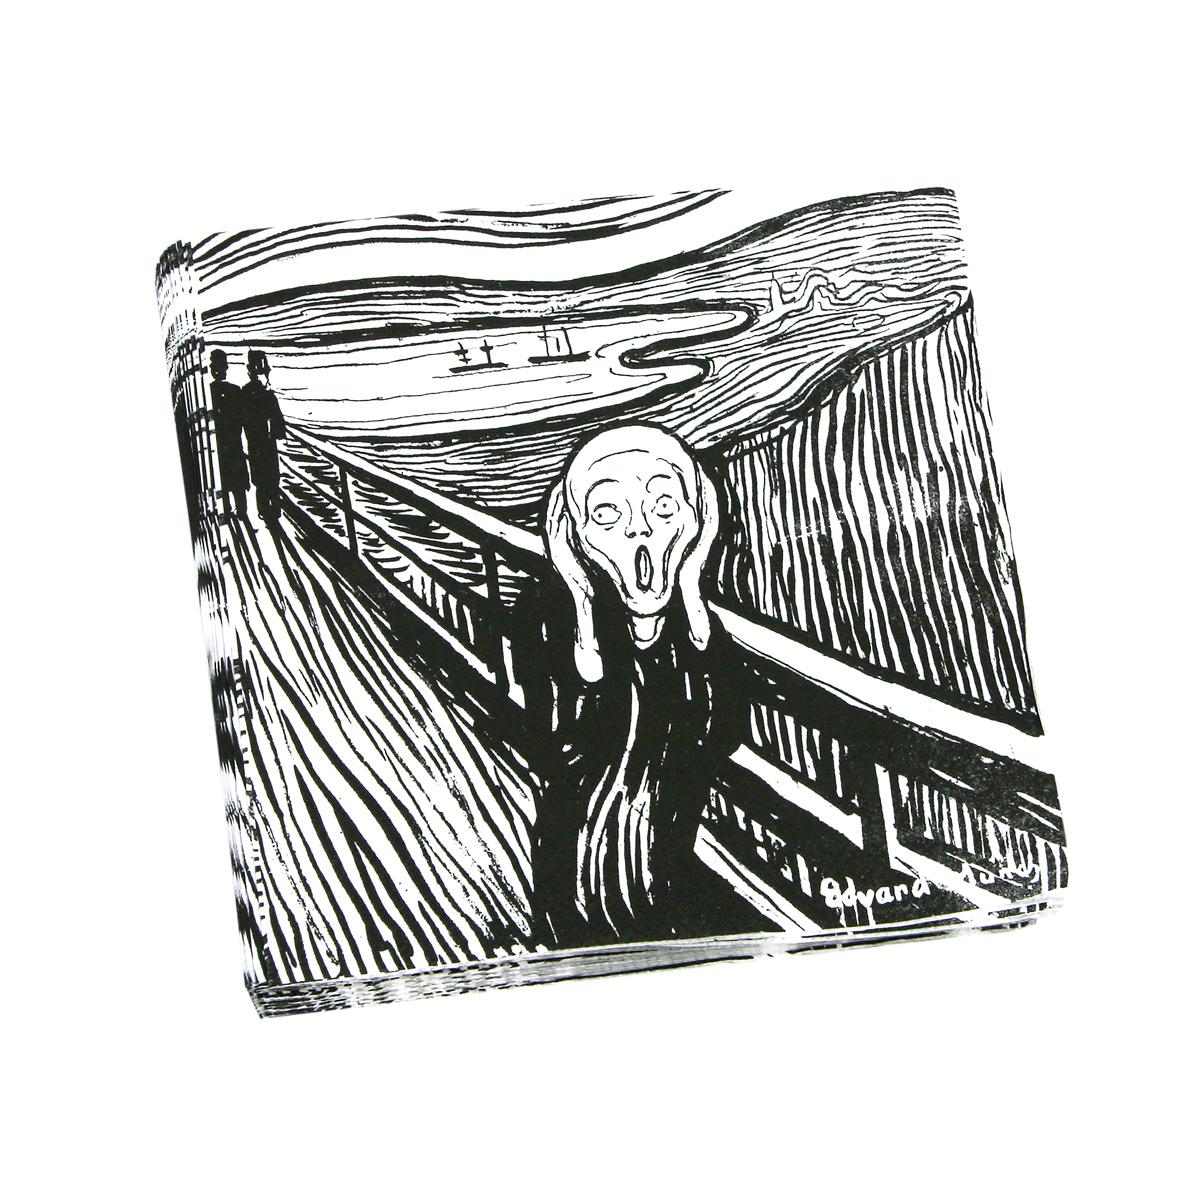 The Scream napkins